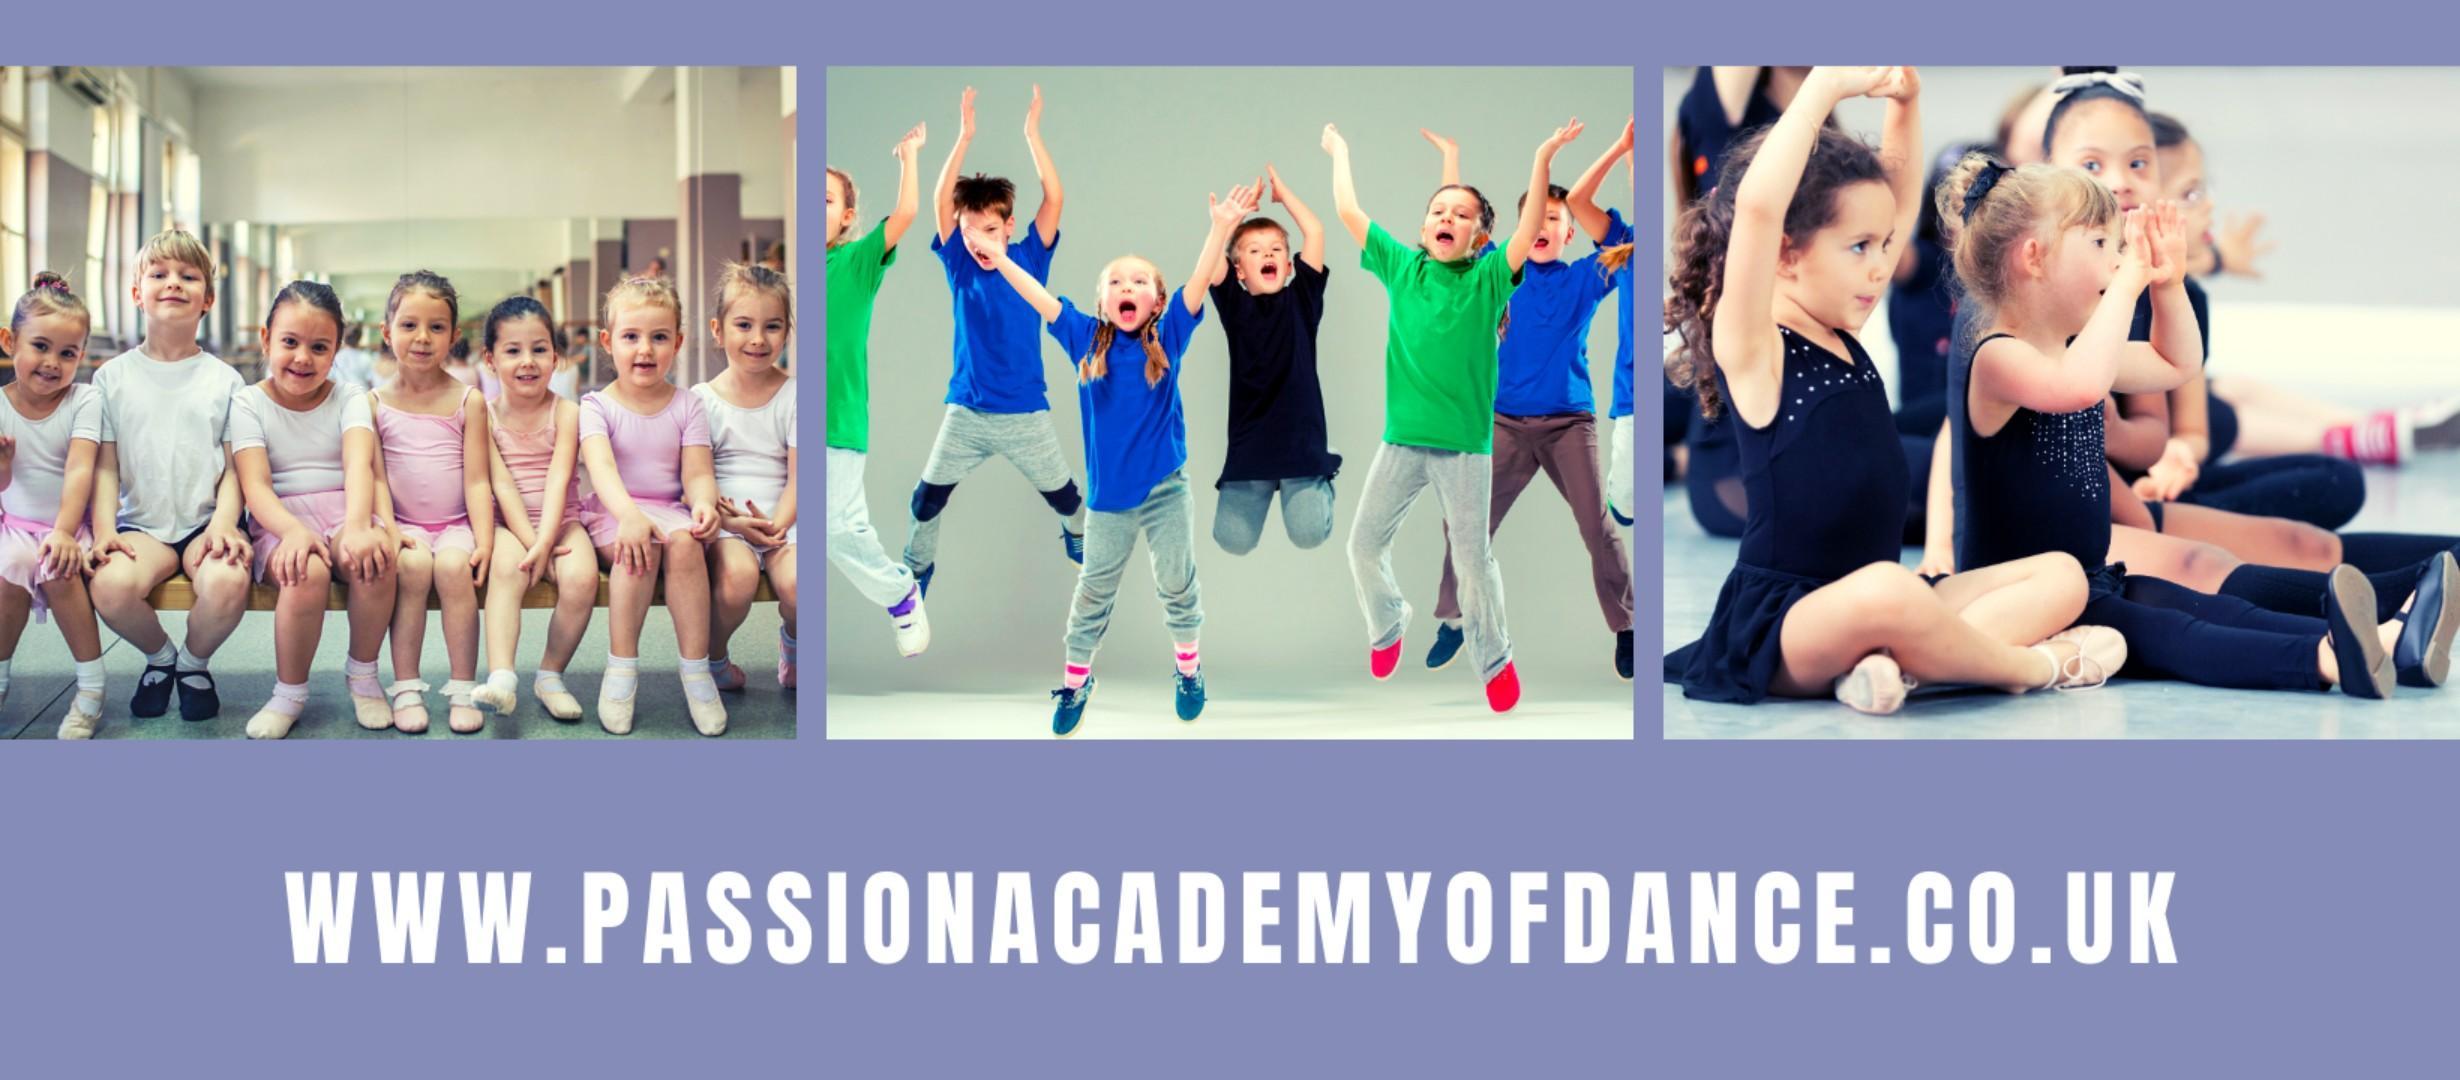 three pictures of children dancing, text underneath with dance school website www.passionacademyofdance.co.uk